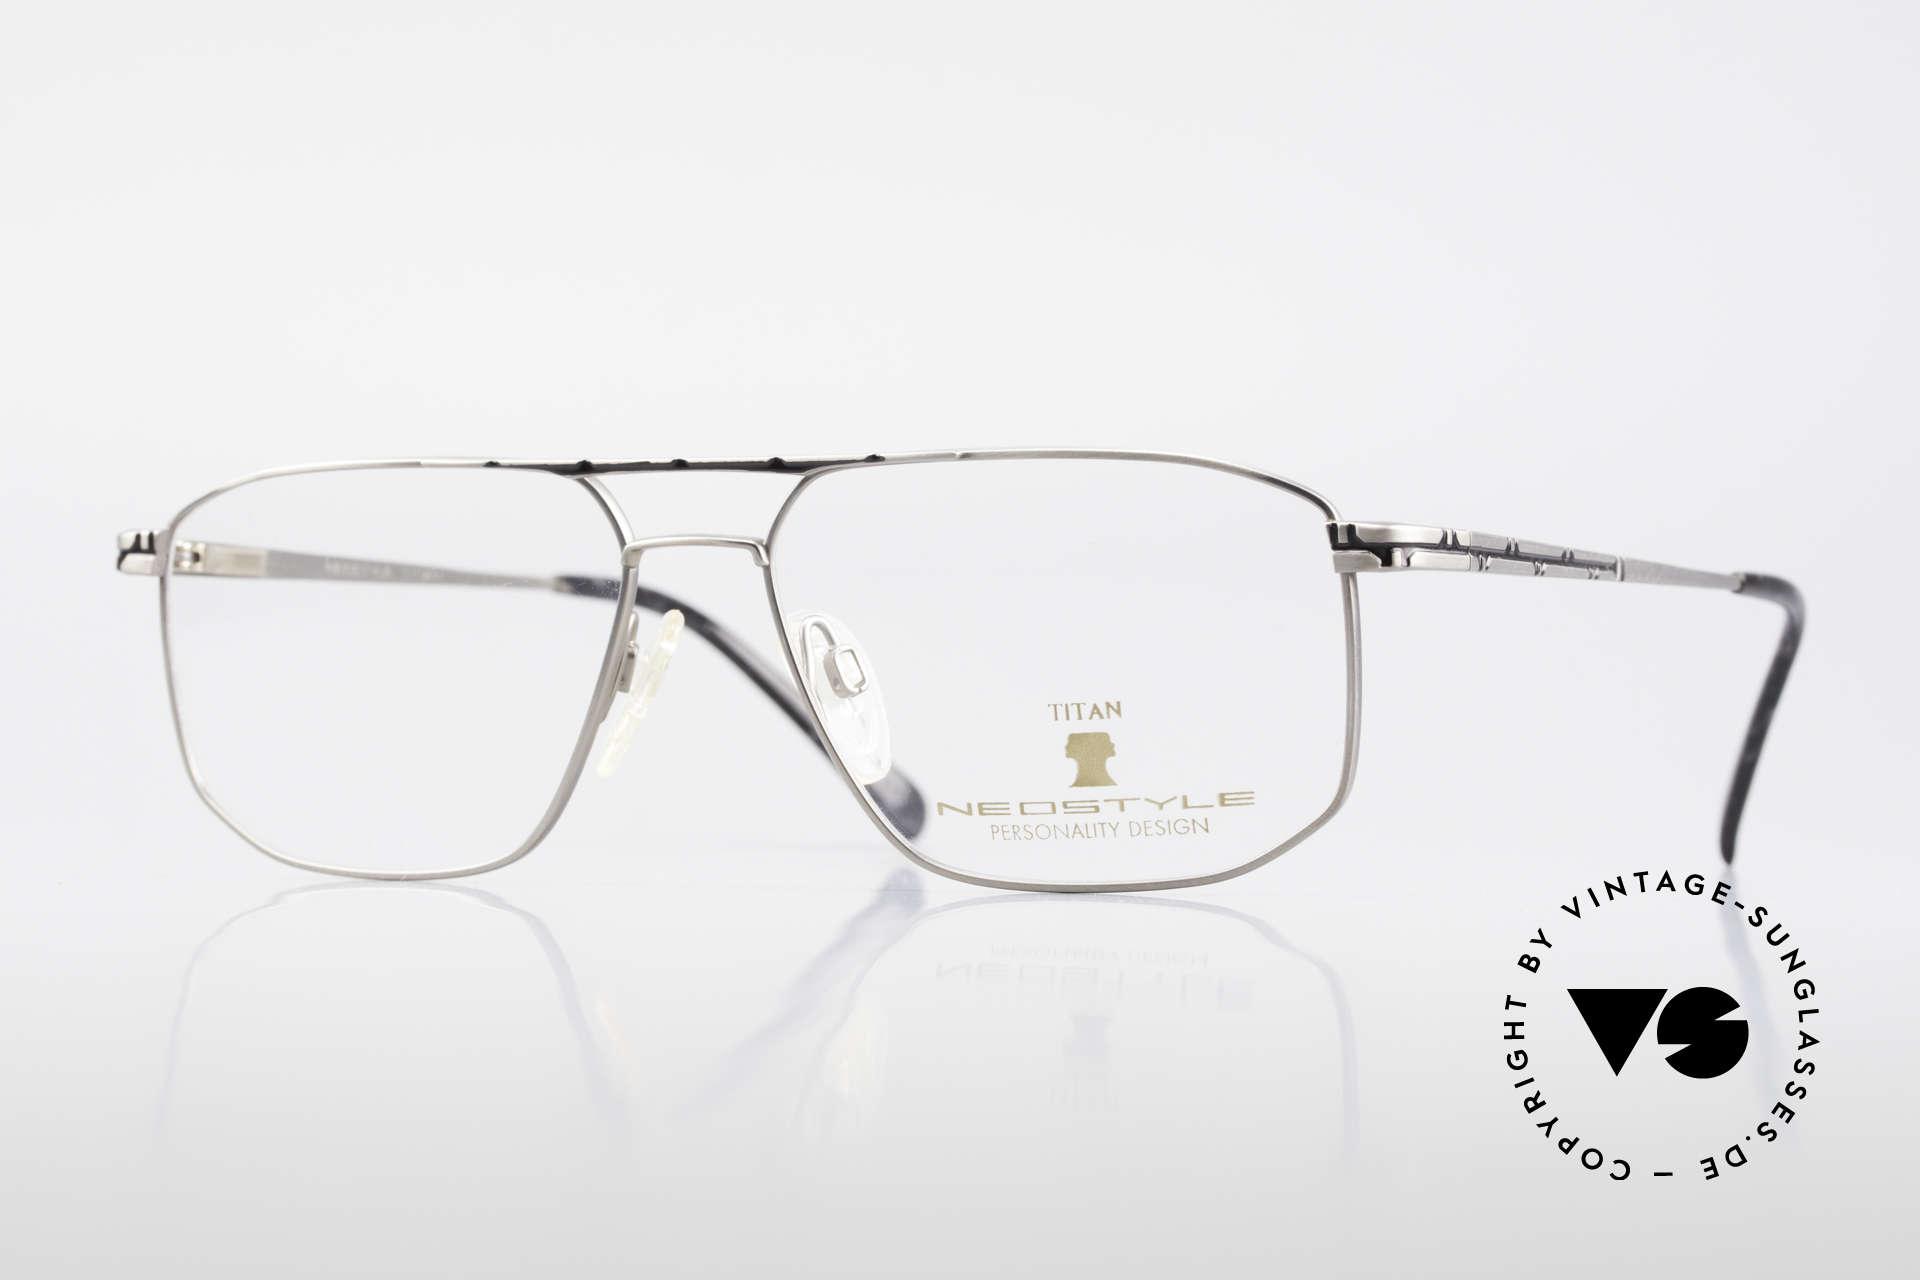 Neostyle Dynasty 362 XL Titanium Eyeglasses Men, striking NEOSTYLE men's glasses; X-LARGE size, Made for Men